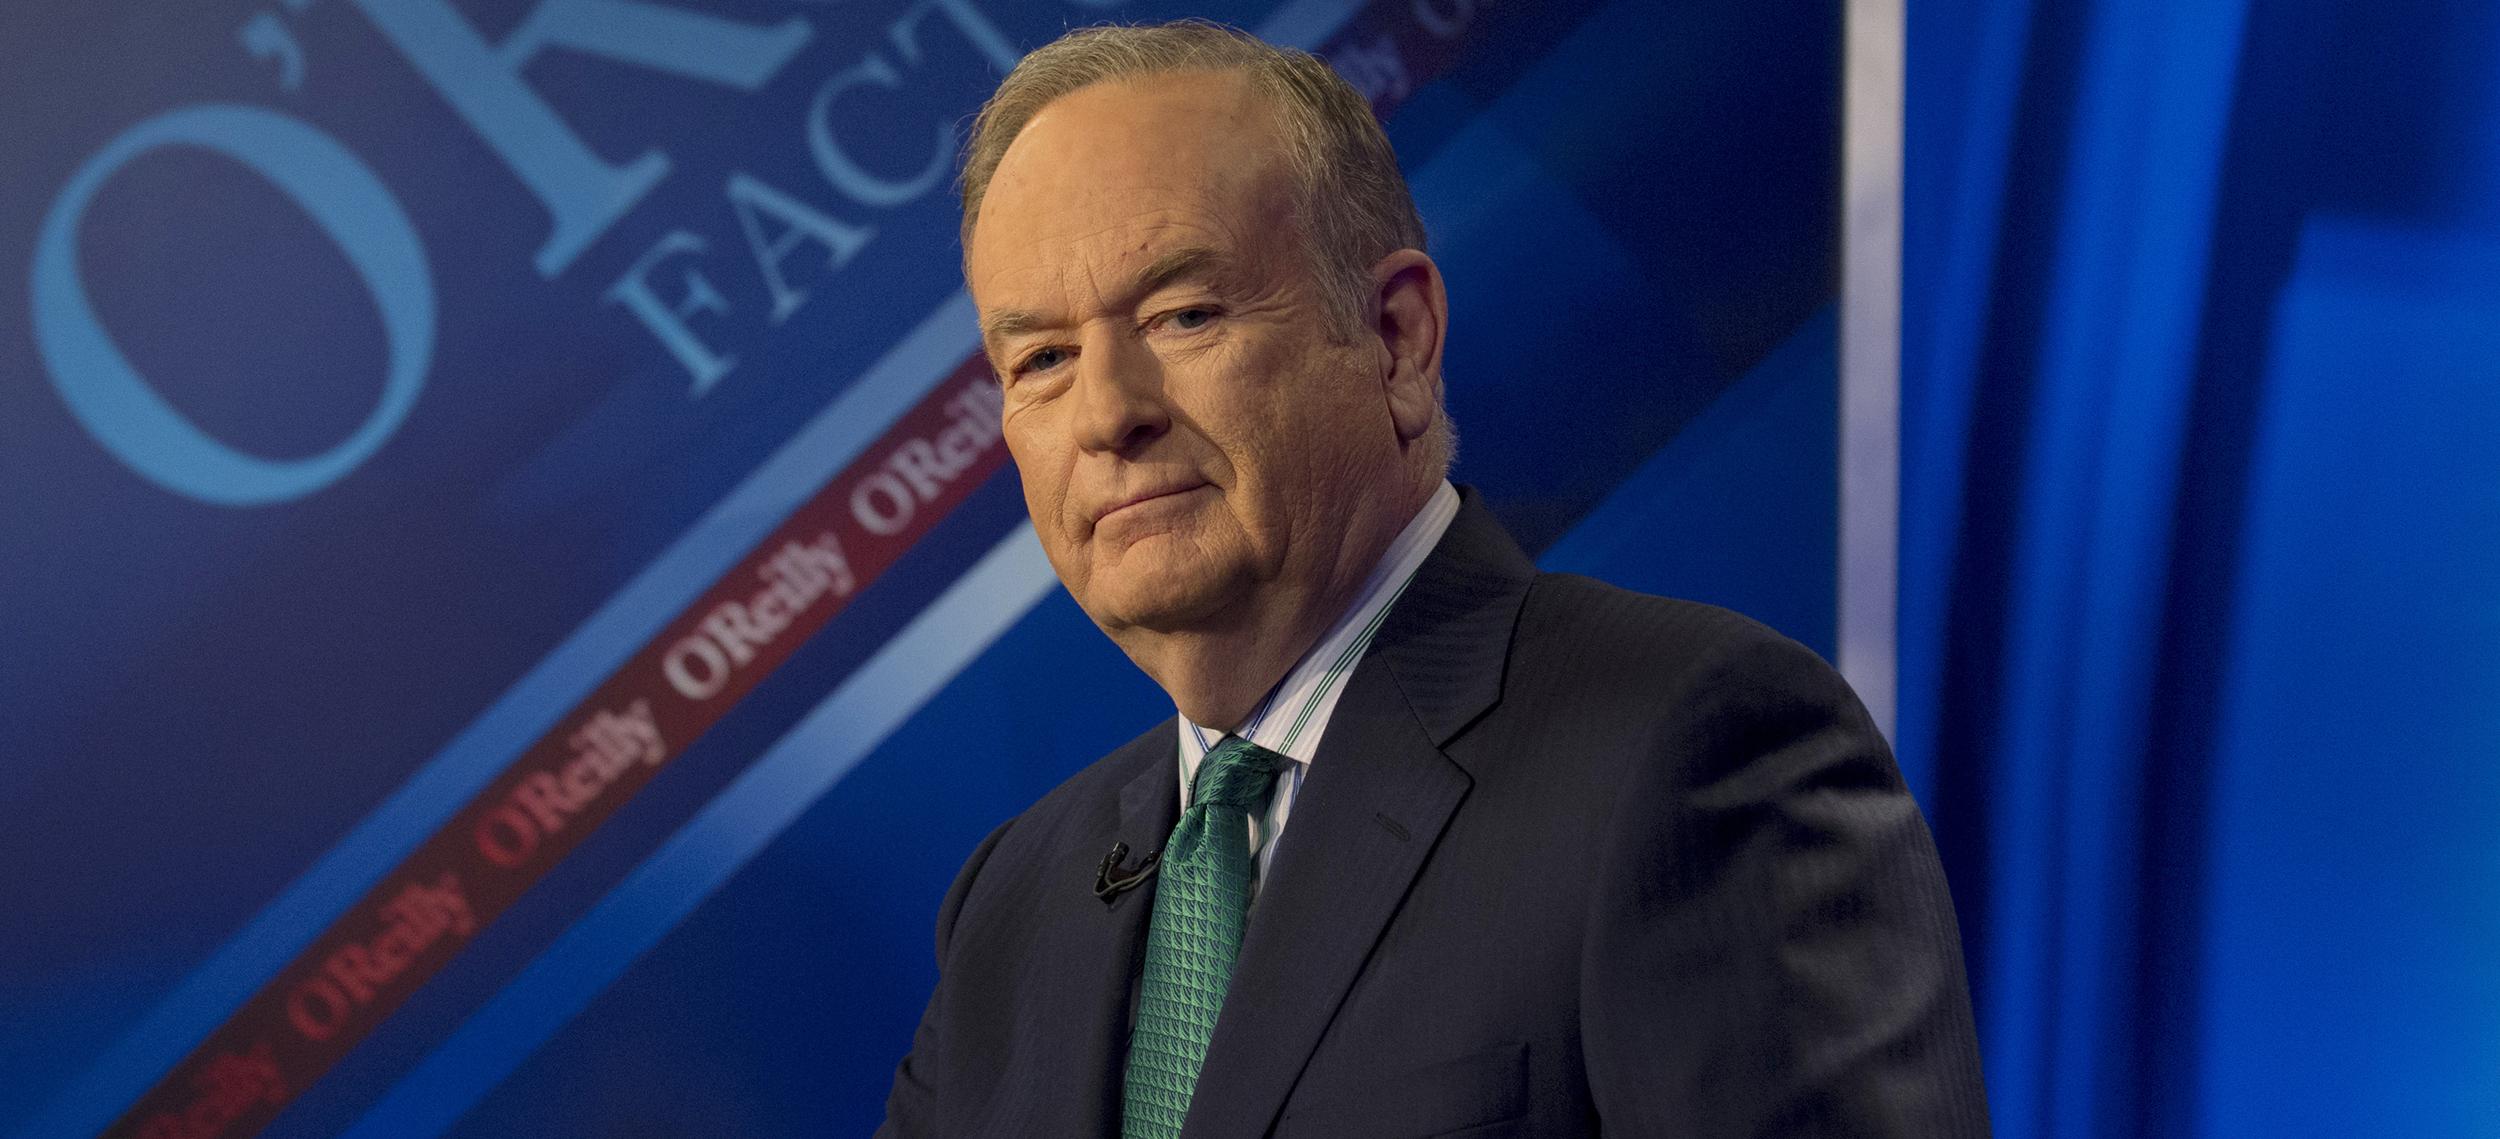 Bill O'Reilly - Photo courtesy of NBC News